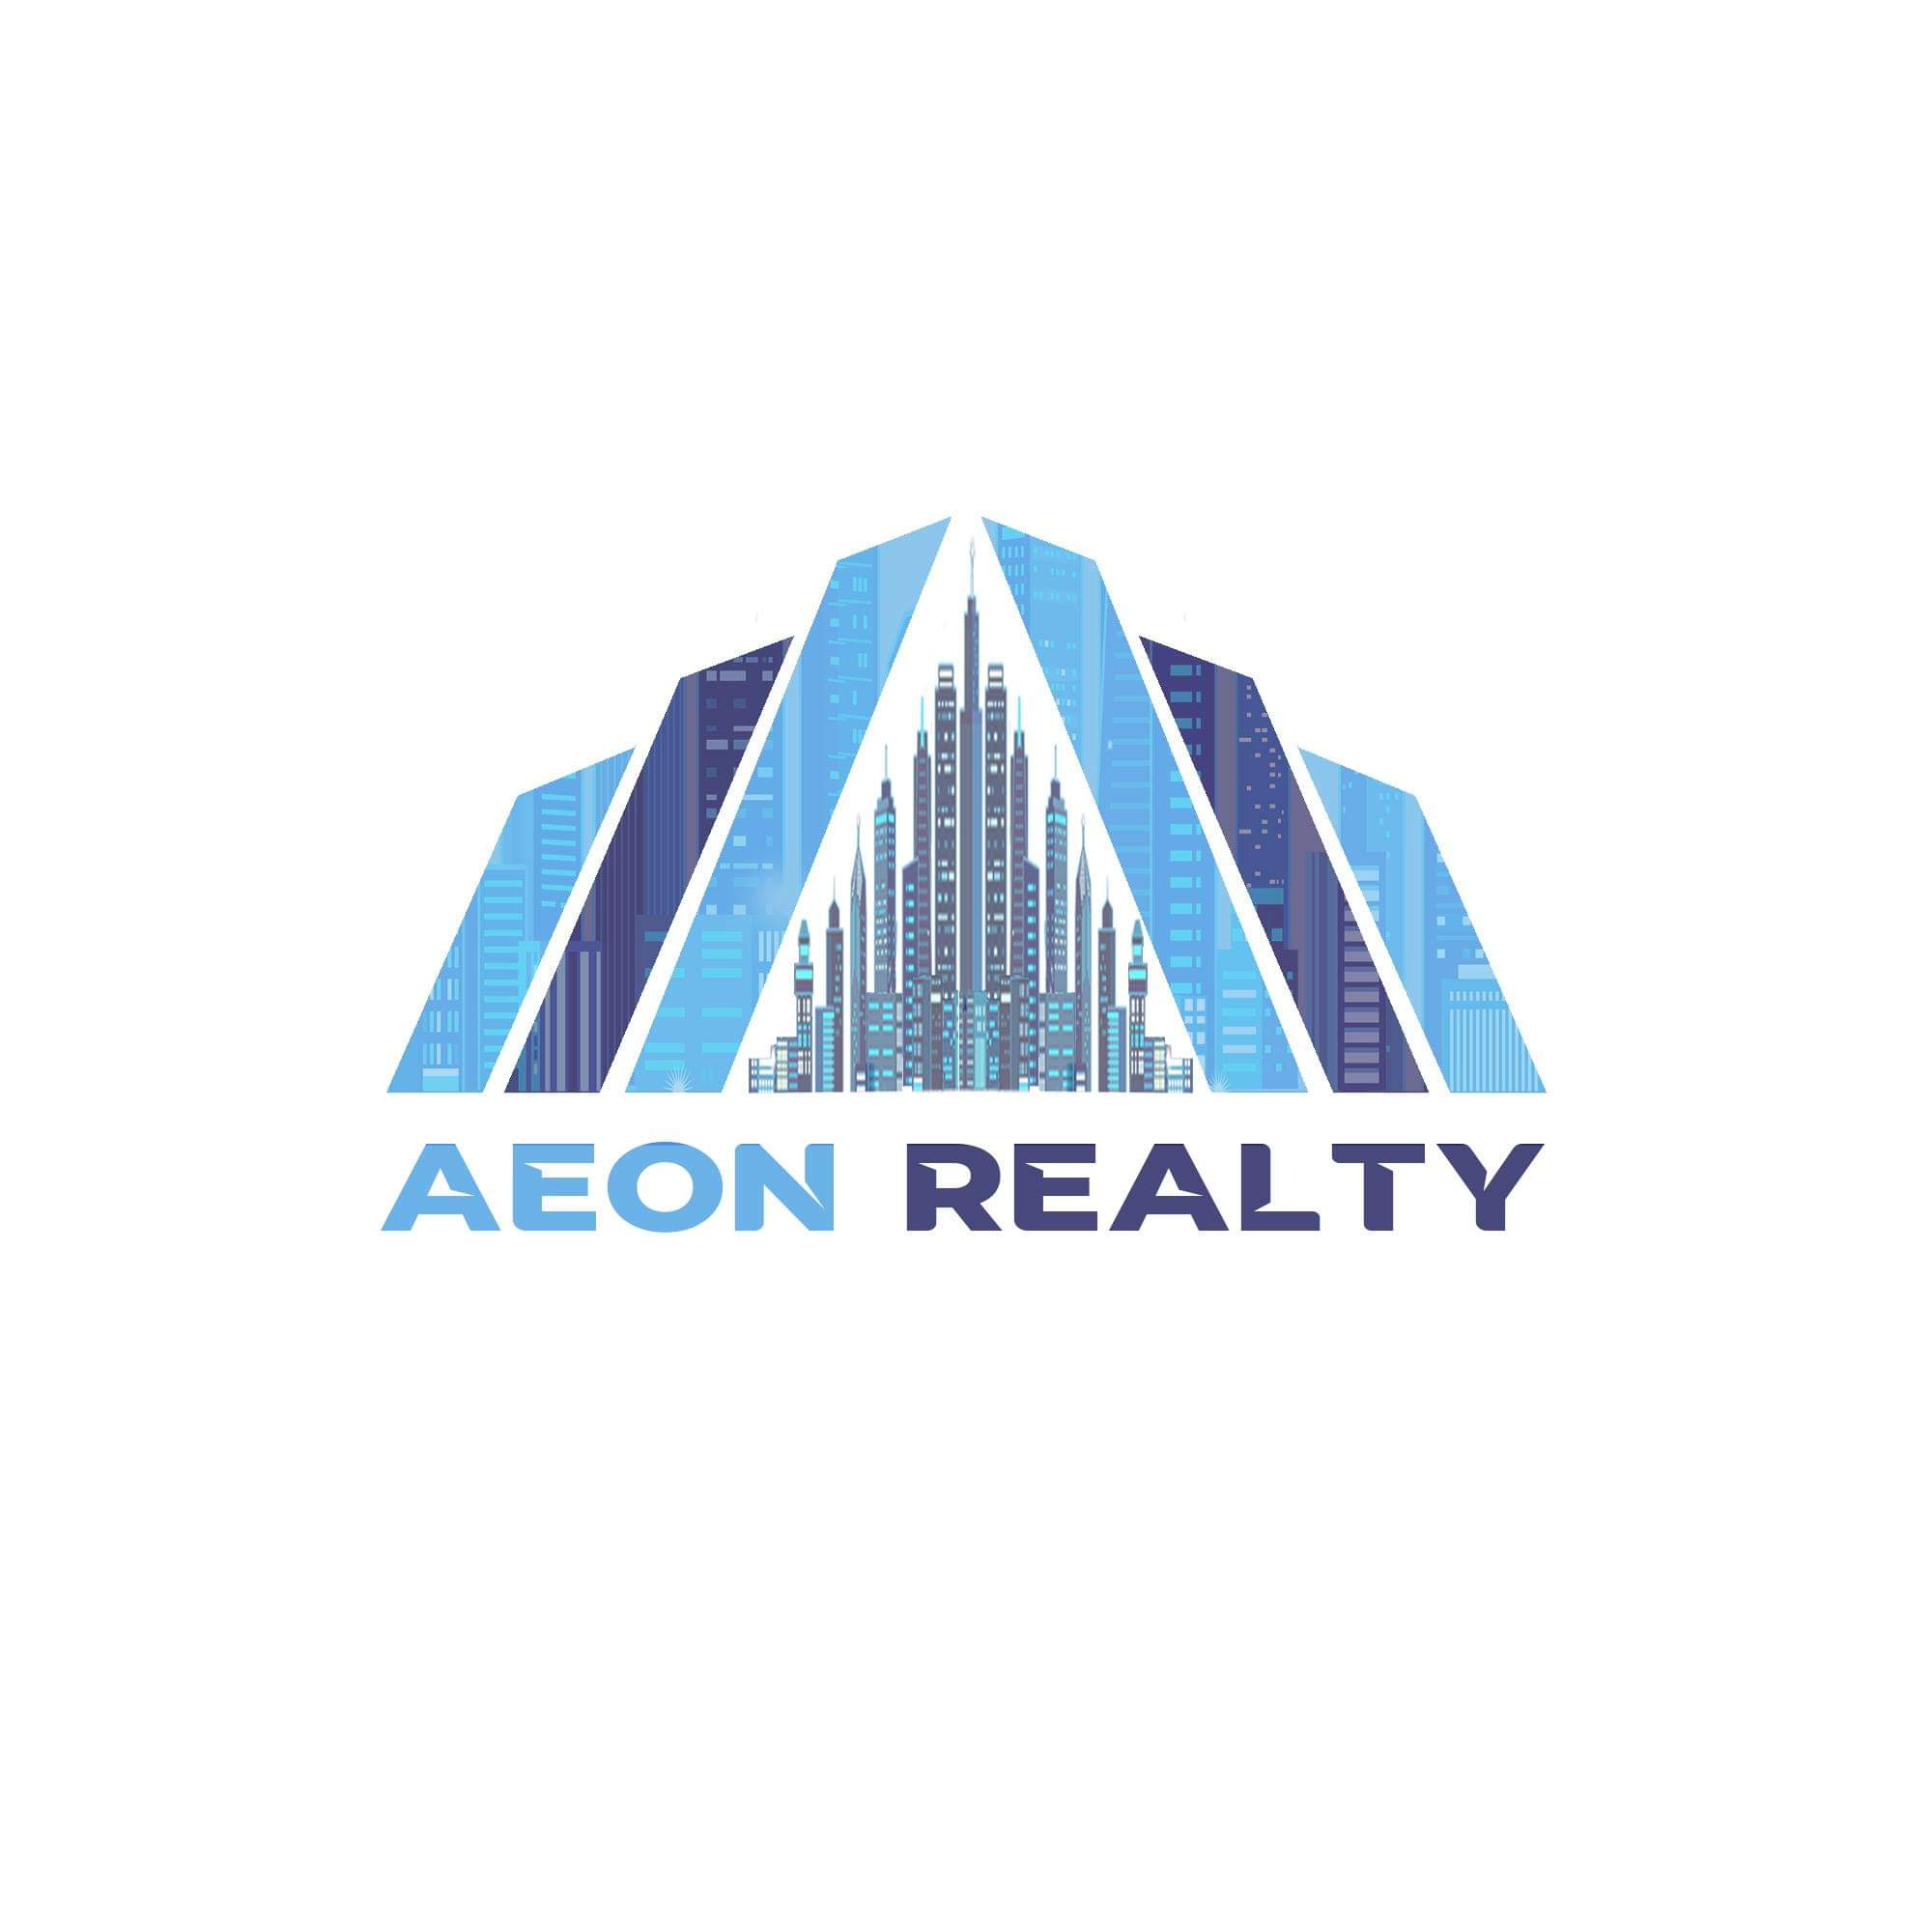 Aeon Realty